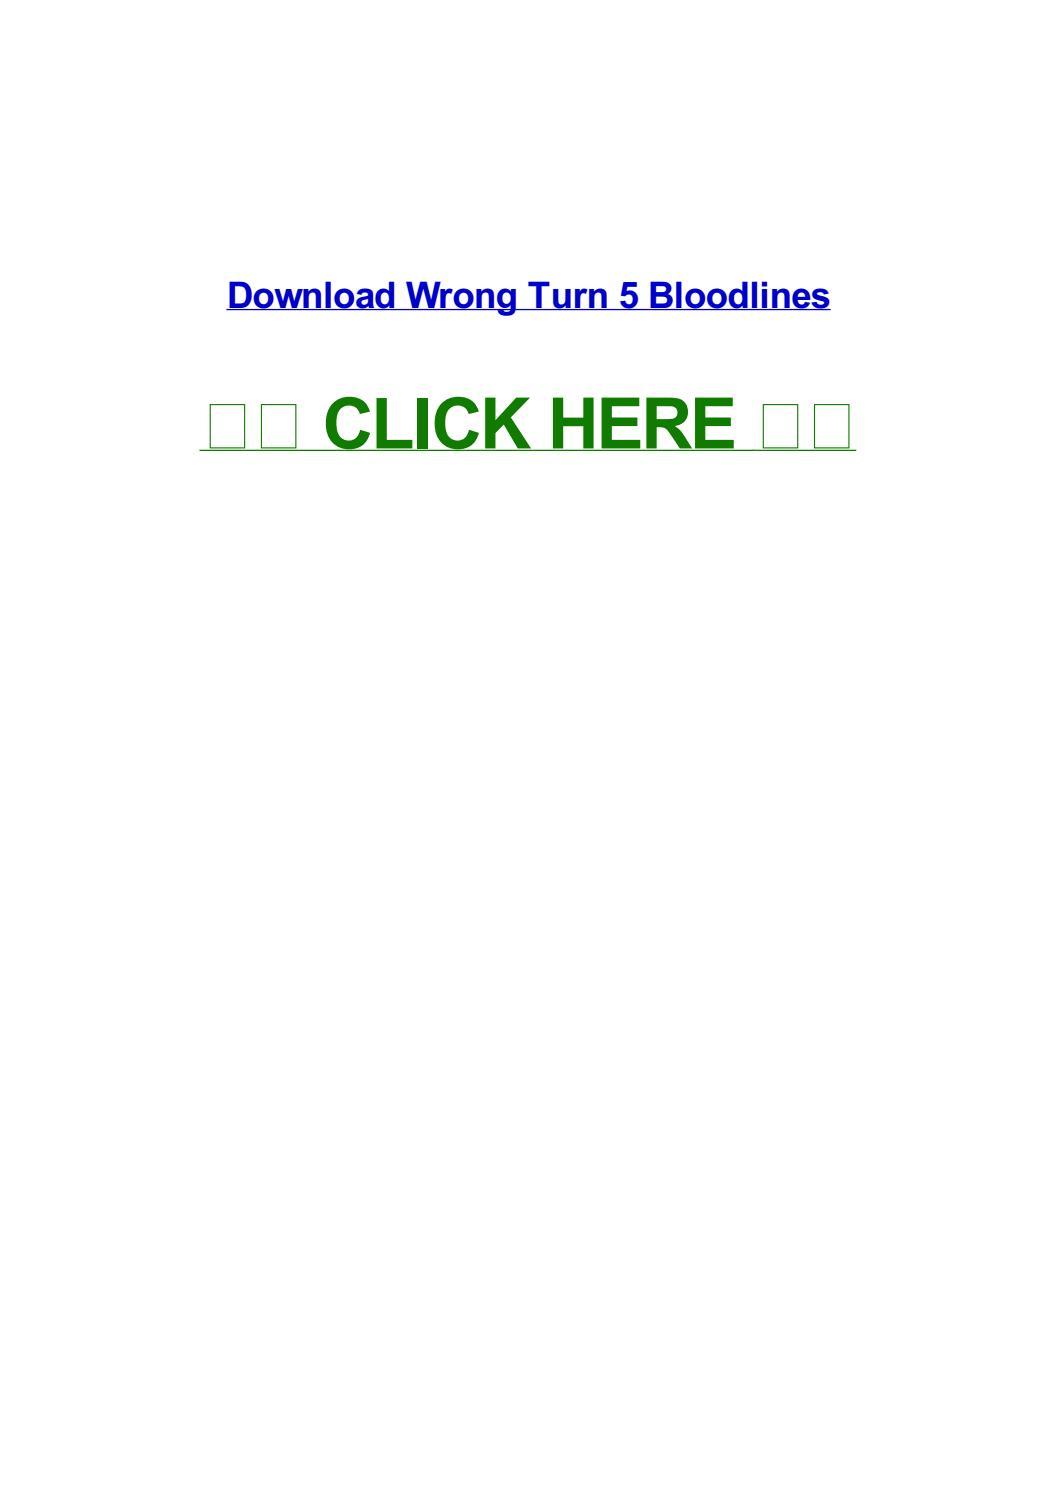 wrong turn 5 bloodlines by hannahglcw - issuu